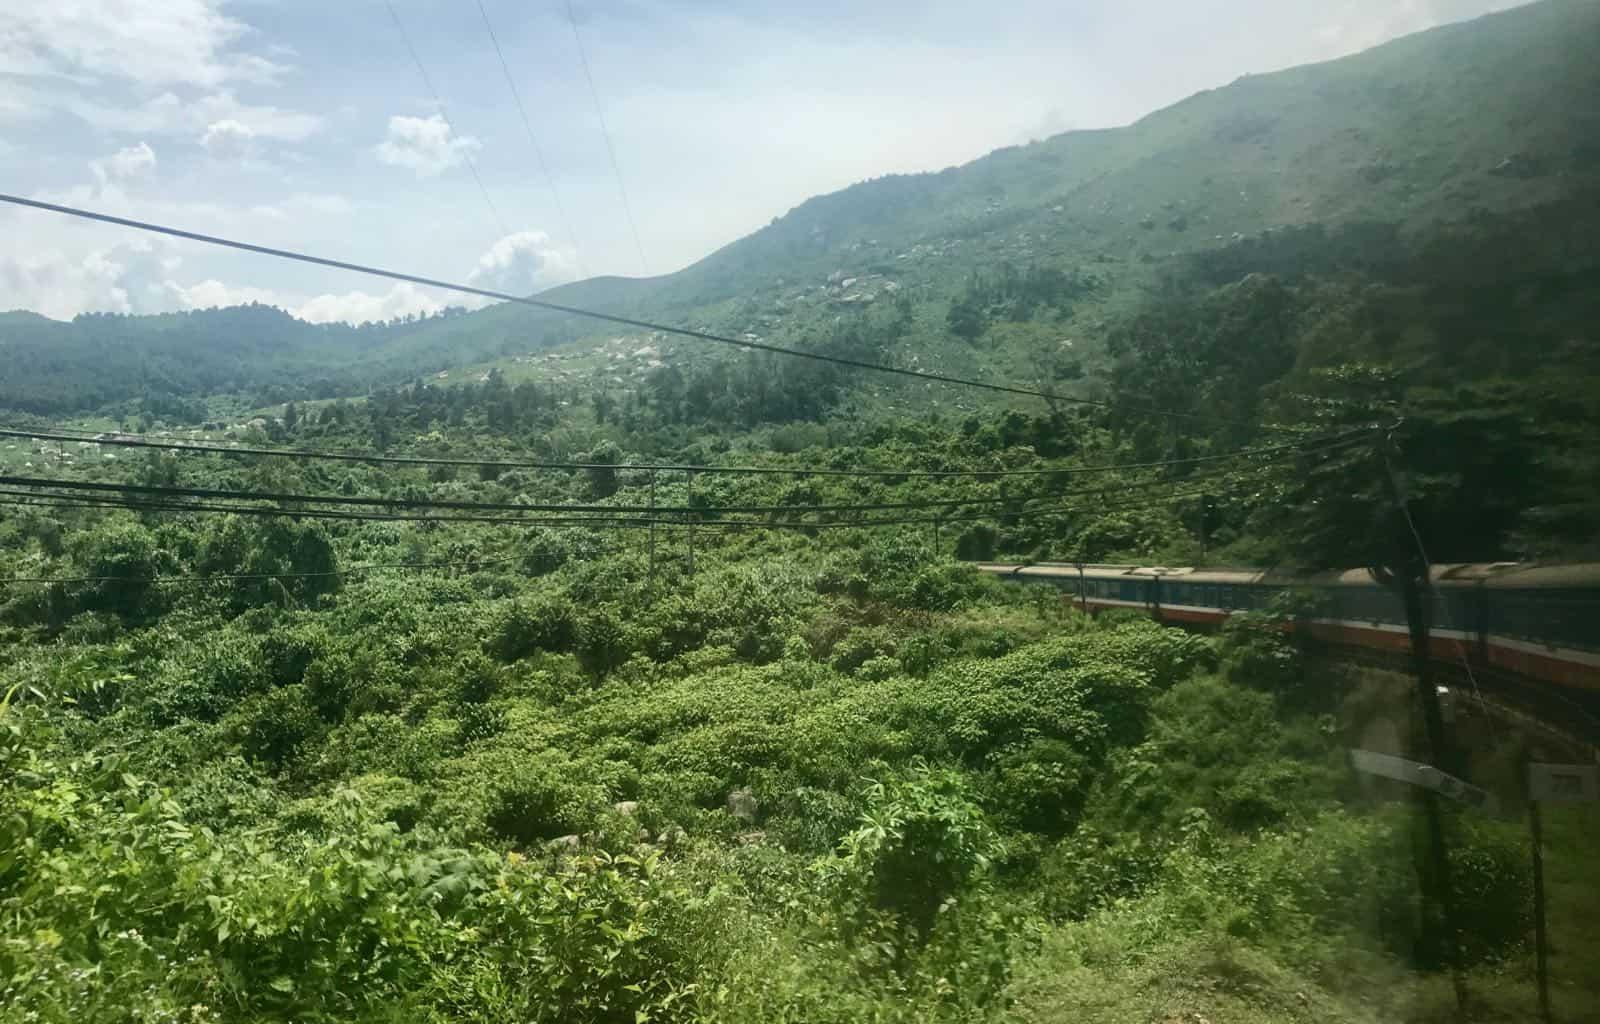 Train Hanoi to Hoi An betternotstop